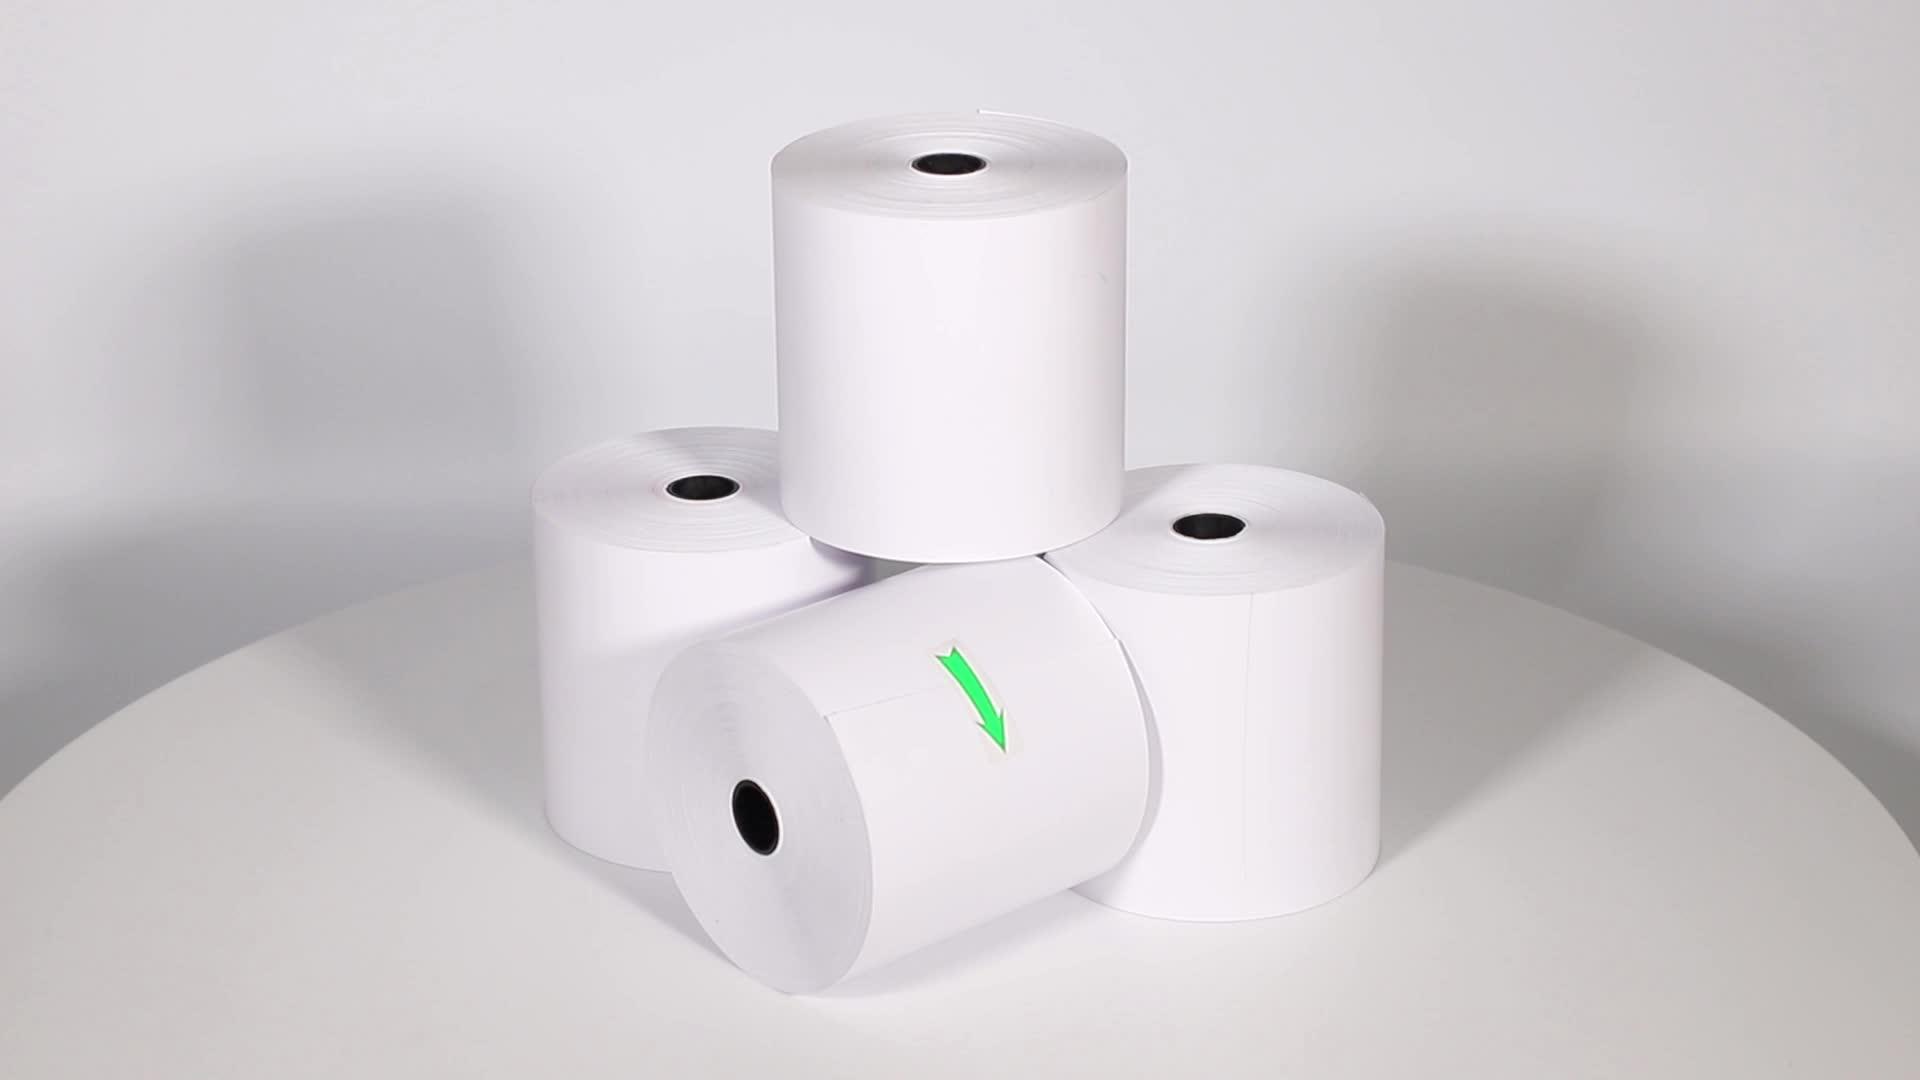 Termal kağıt rulosu iş 80x80mm 70gsm endonezya malezya yazarkasa tedarikçileri 3 1/8x230